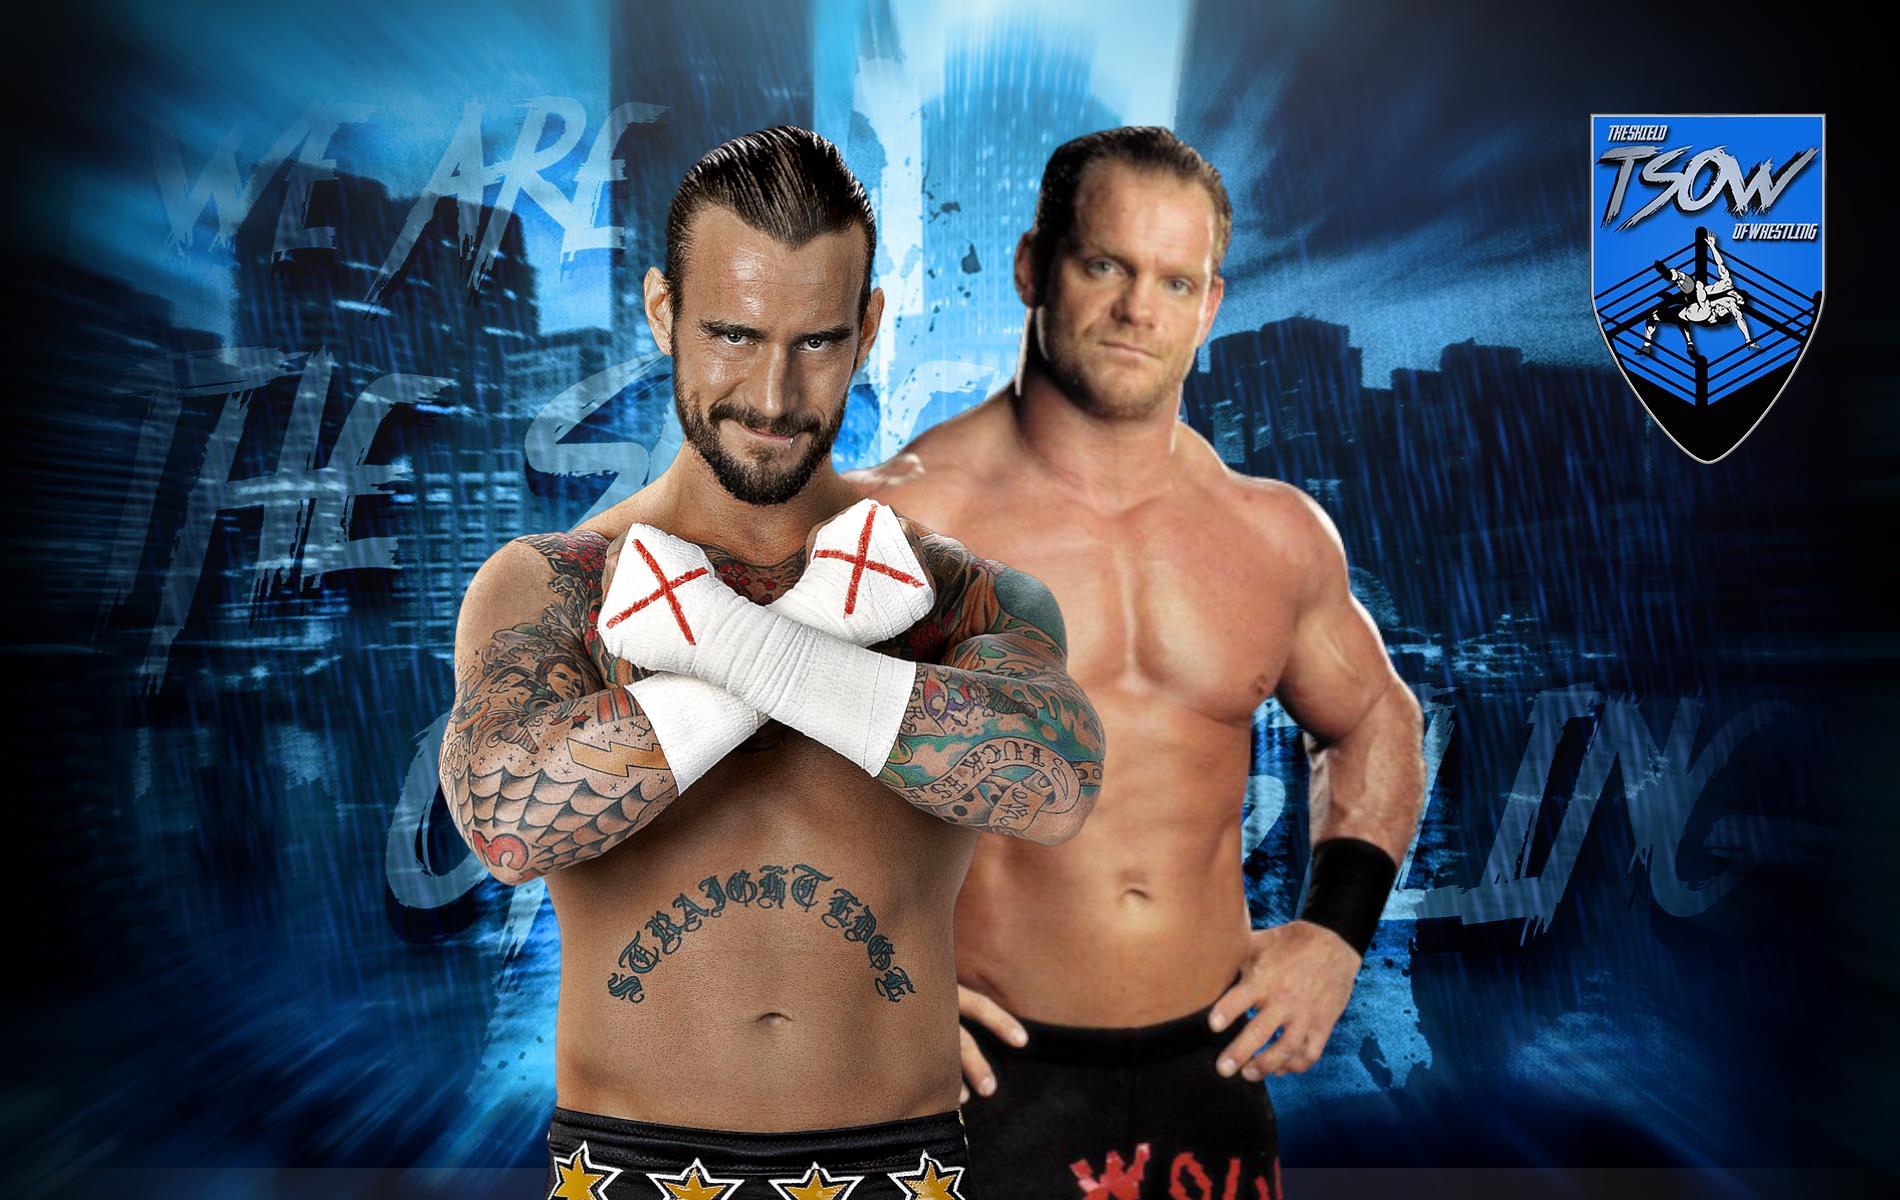 CM Punk e Chris Benoit avrebbero avuto un feud violento